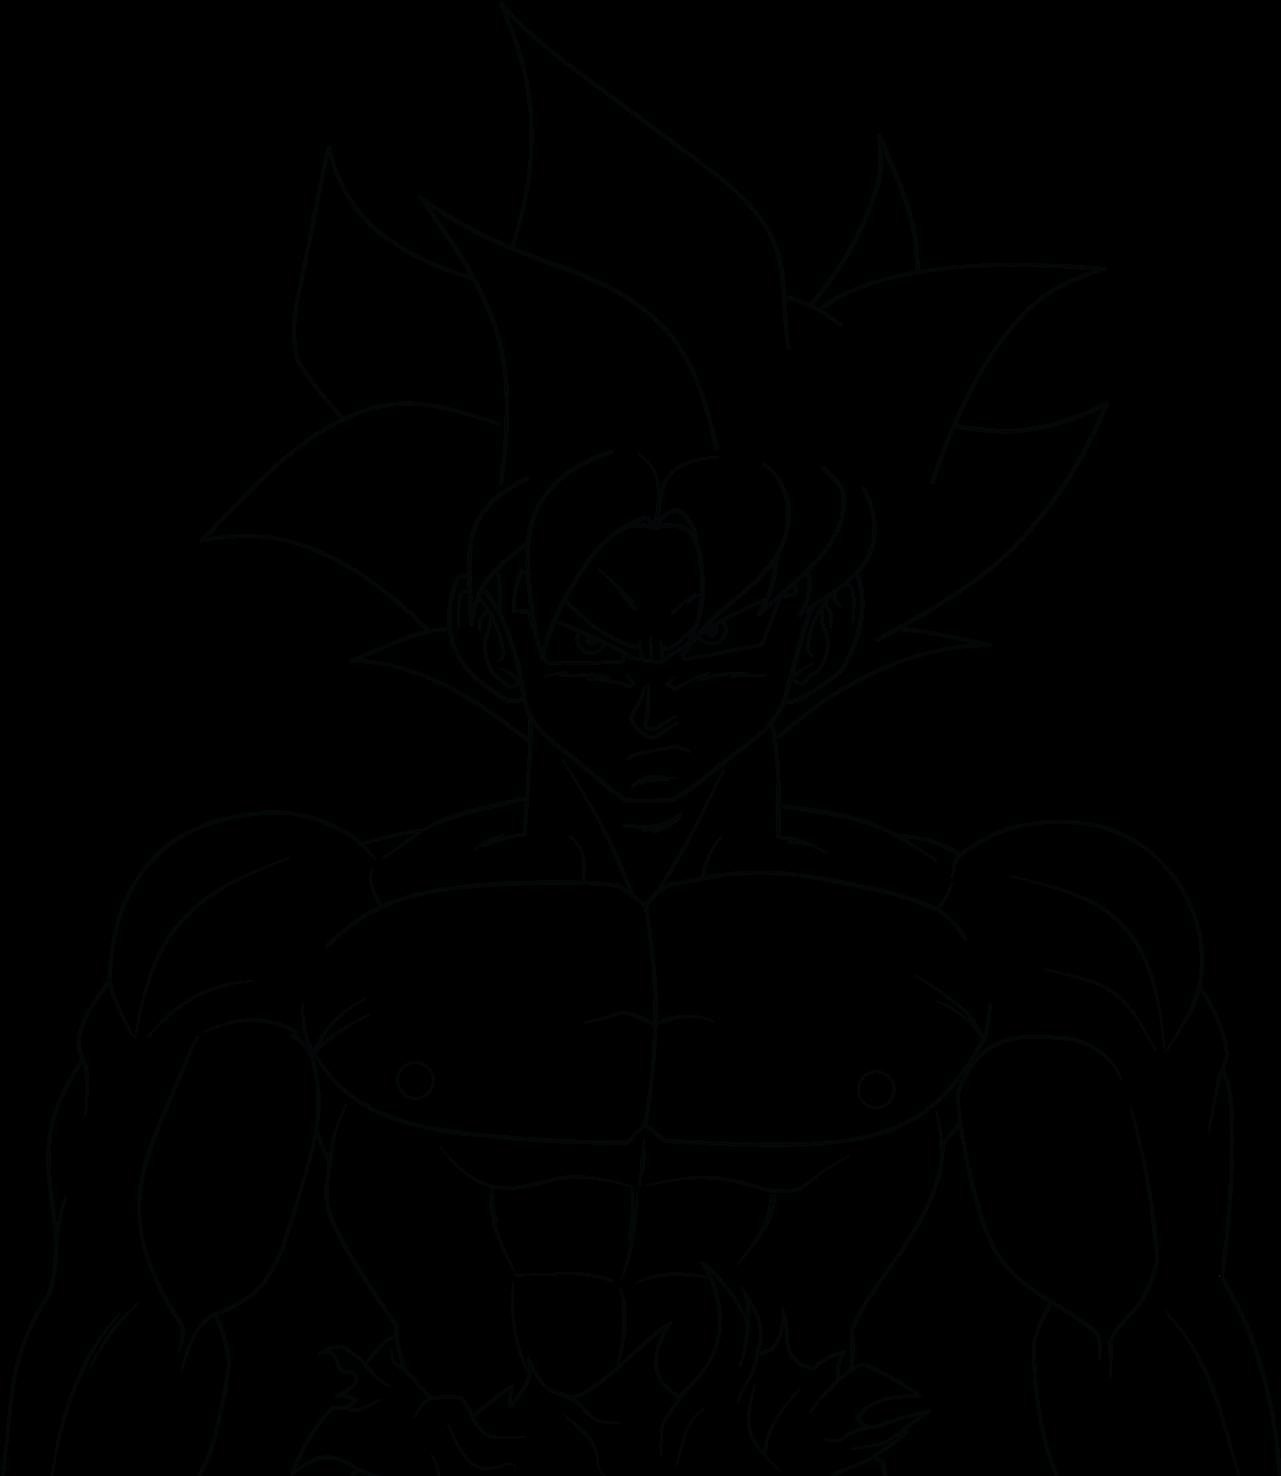 28 Collection Of Ultra Instinct Goku Drawing Easy Goku Ultra Instinct Drawing Full Size Png Download Seekpng